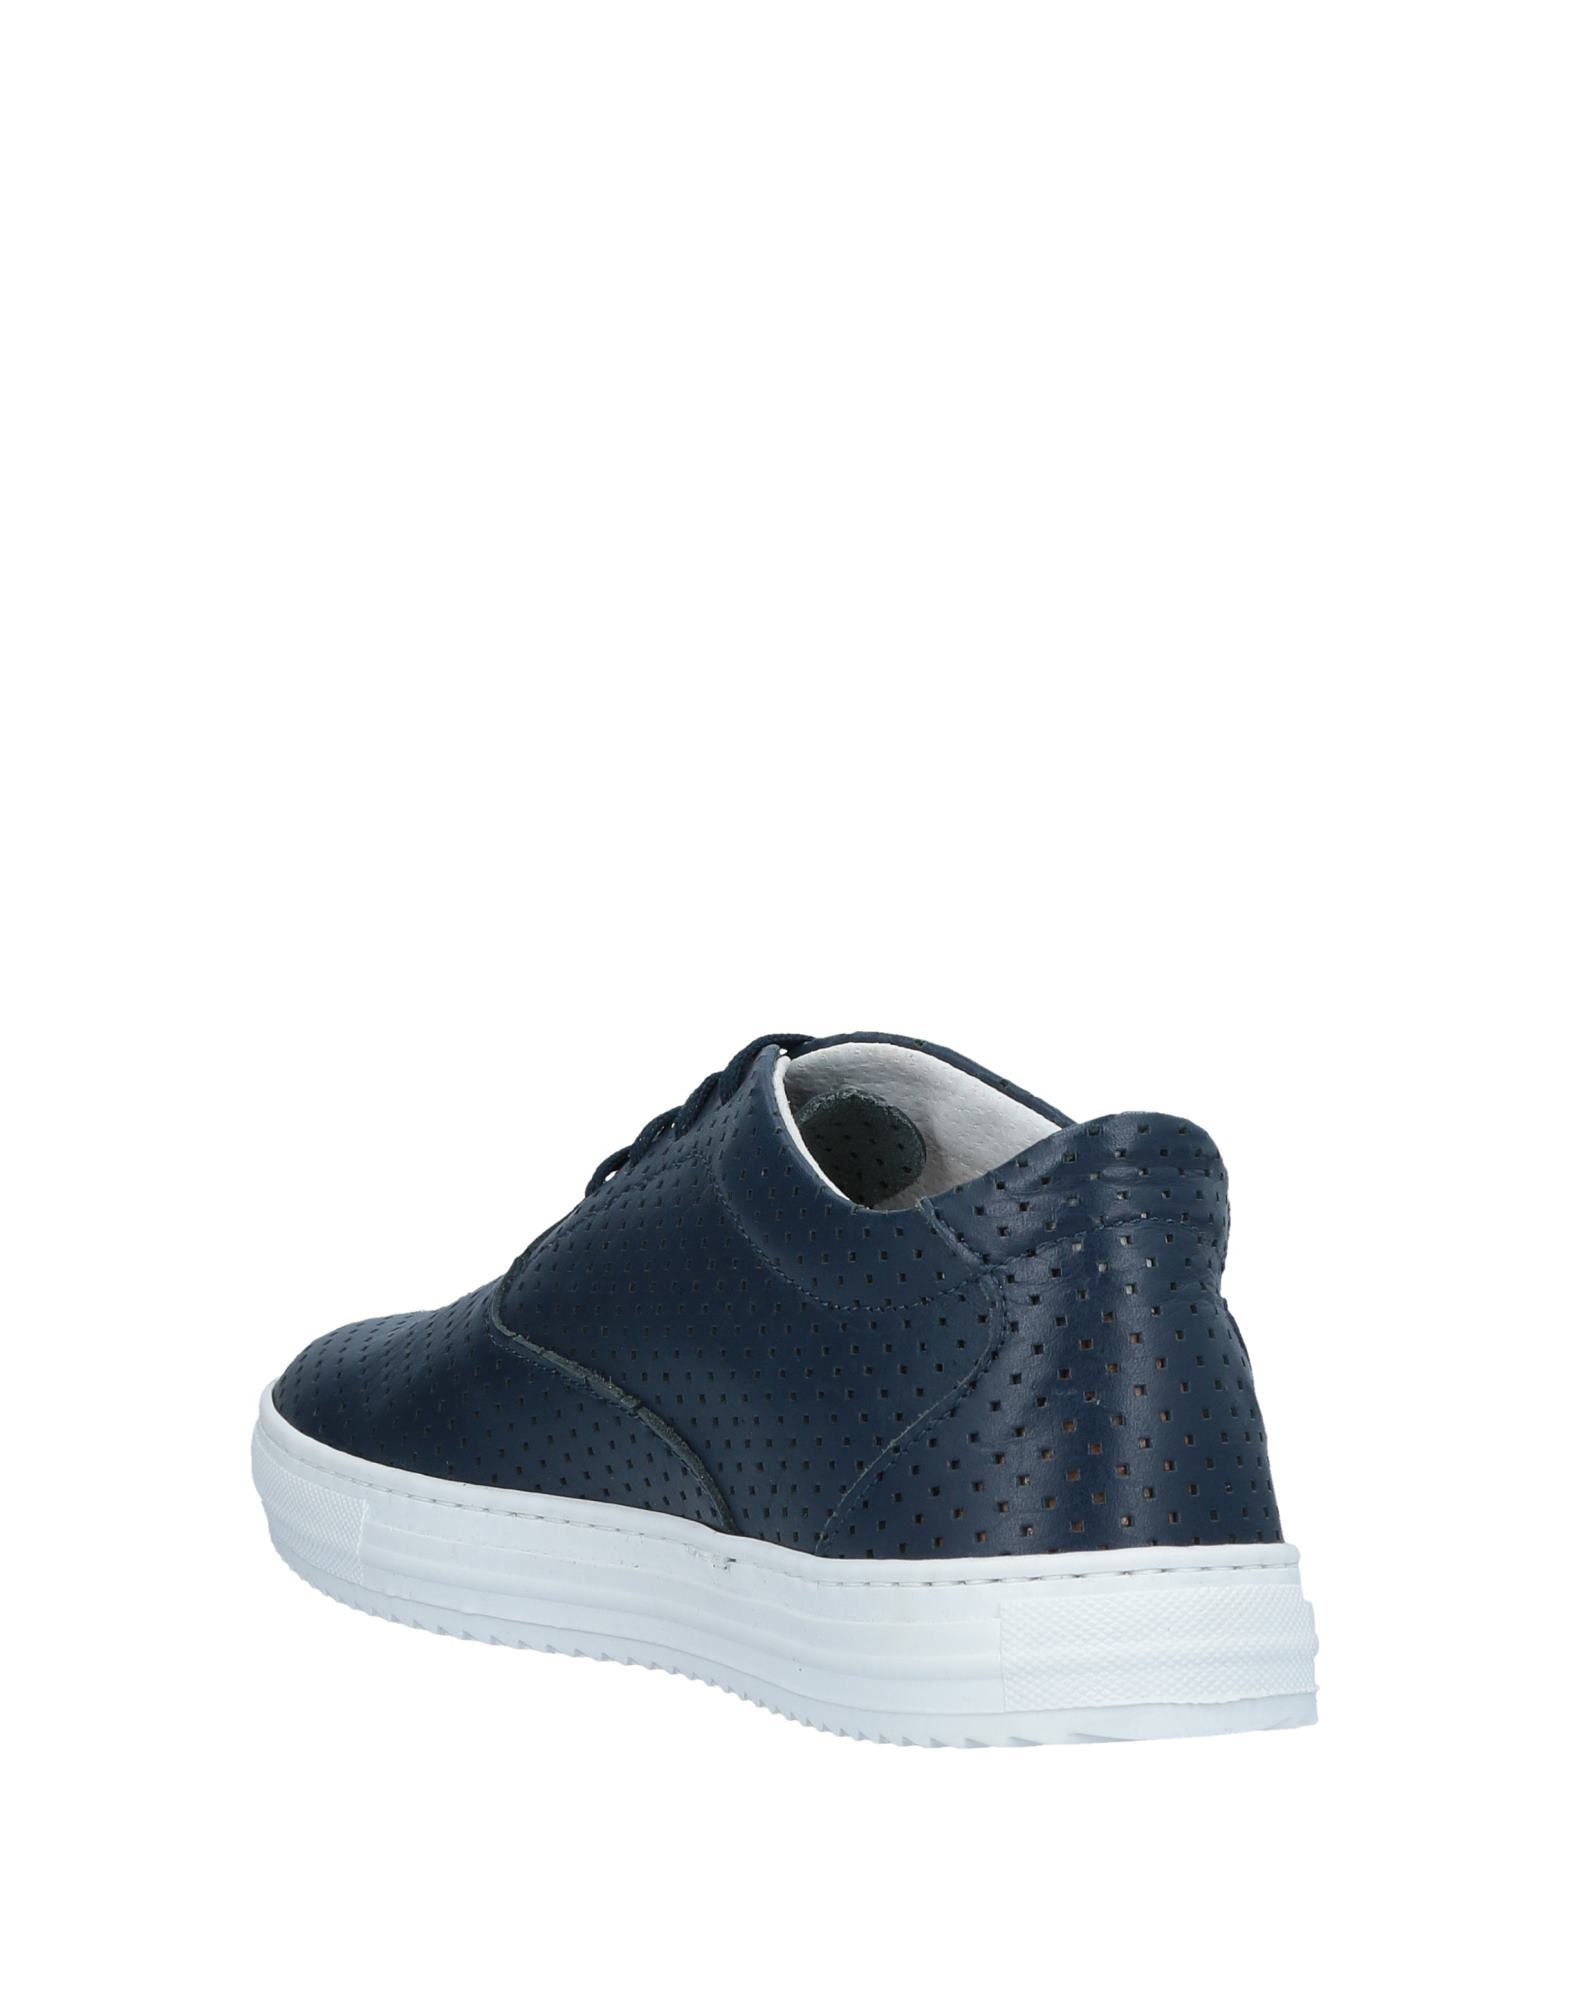 Fratelli Circondato Circondato Fratelli Sneakers Herren  11521101JI Neue Schuhe a1a1c3